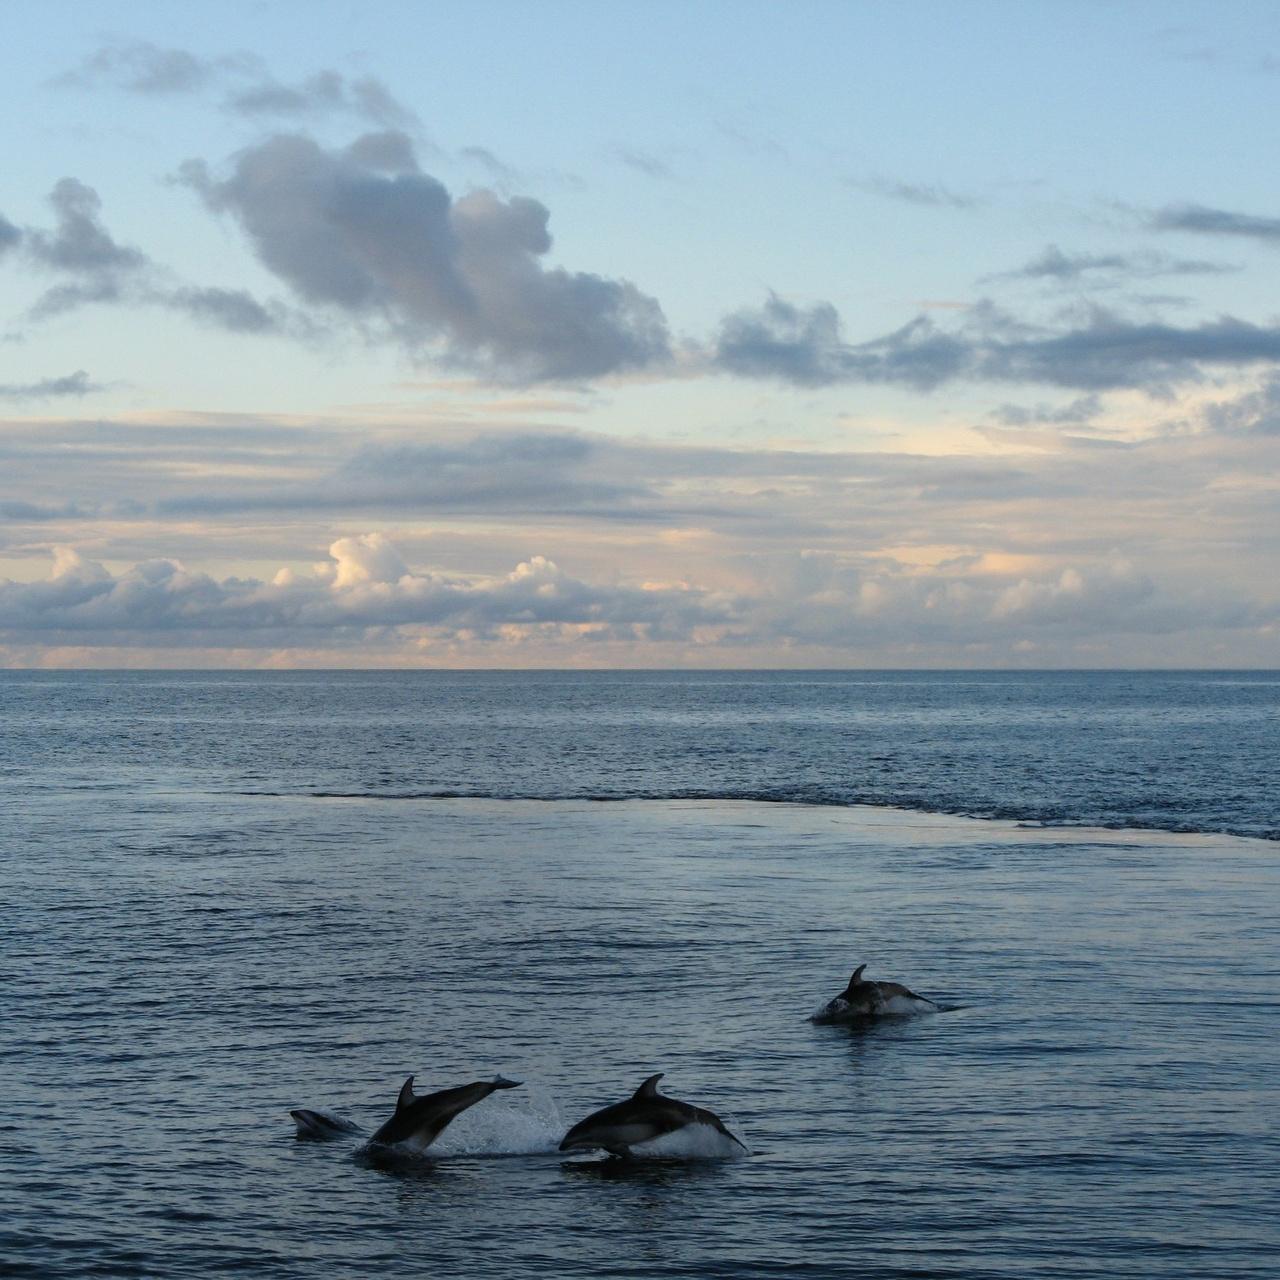 250x250-dolphins-Pacific-Ocean.jpg